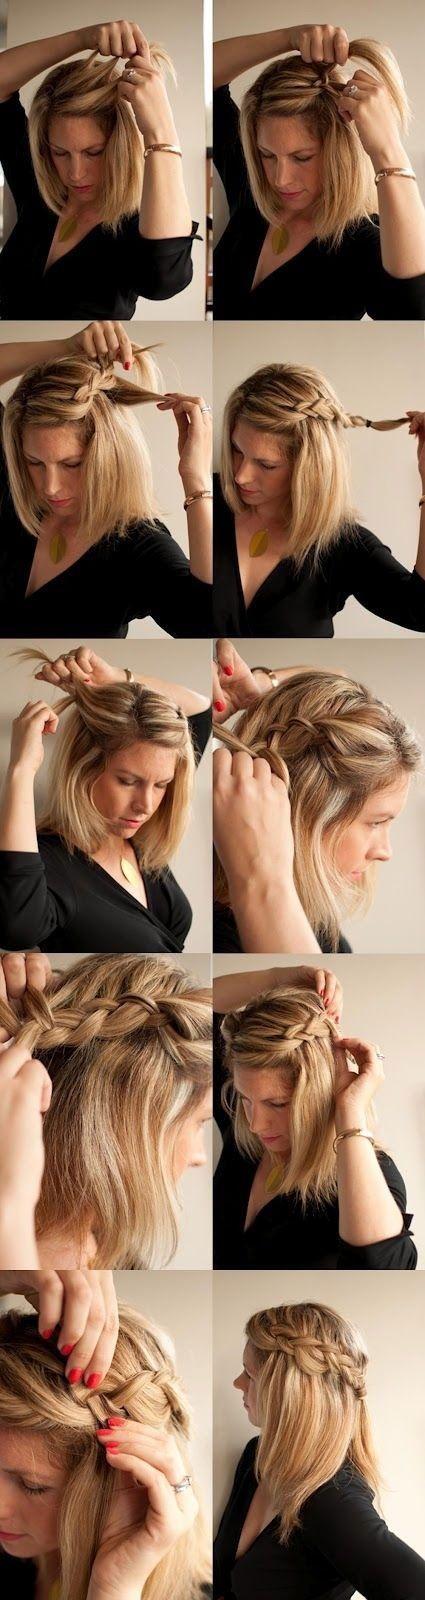 Cabello fácil de usar para cabello de longitud media. #cabello #facil #longitud…